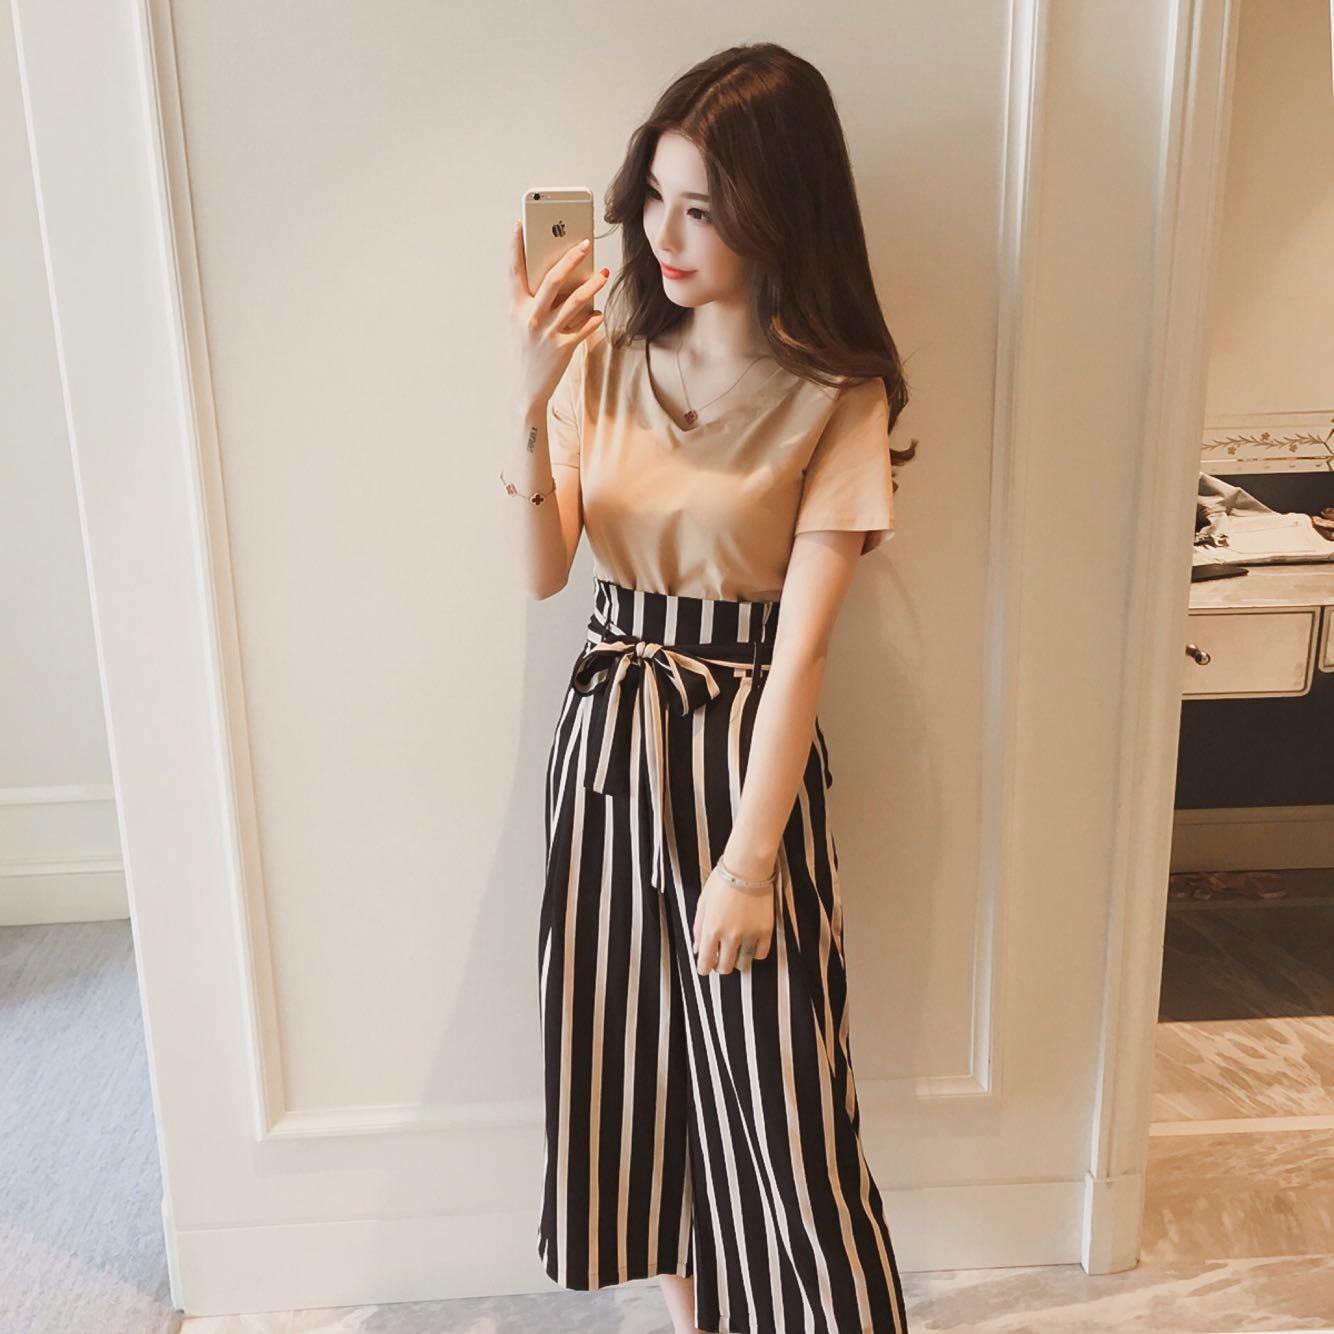 2019 Summer New Style Korean-style V-neck Short Sleeve T-shirt + Stripes Capri Loose Pants WOMEN'S Suit Casual Two-Piece Set Fas